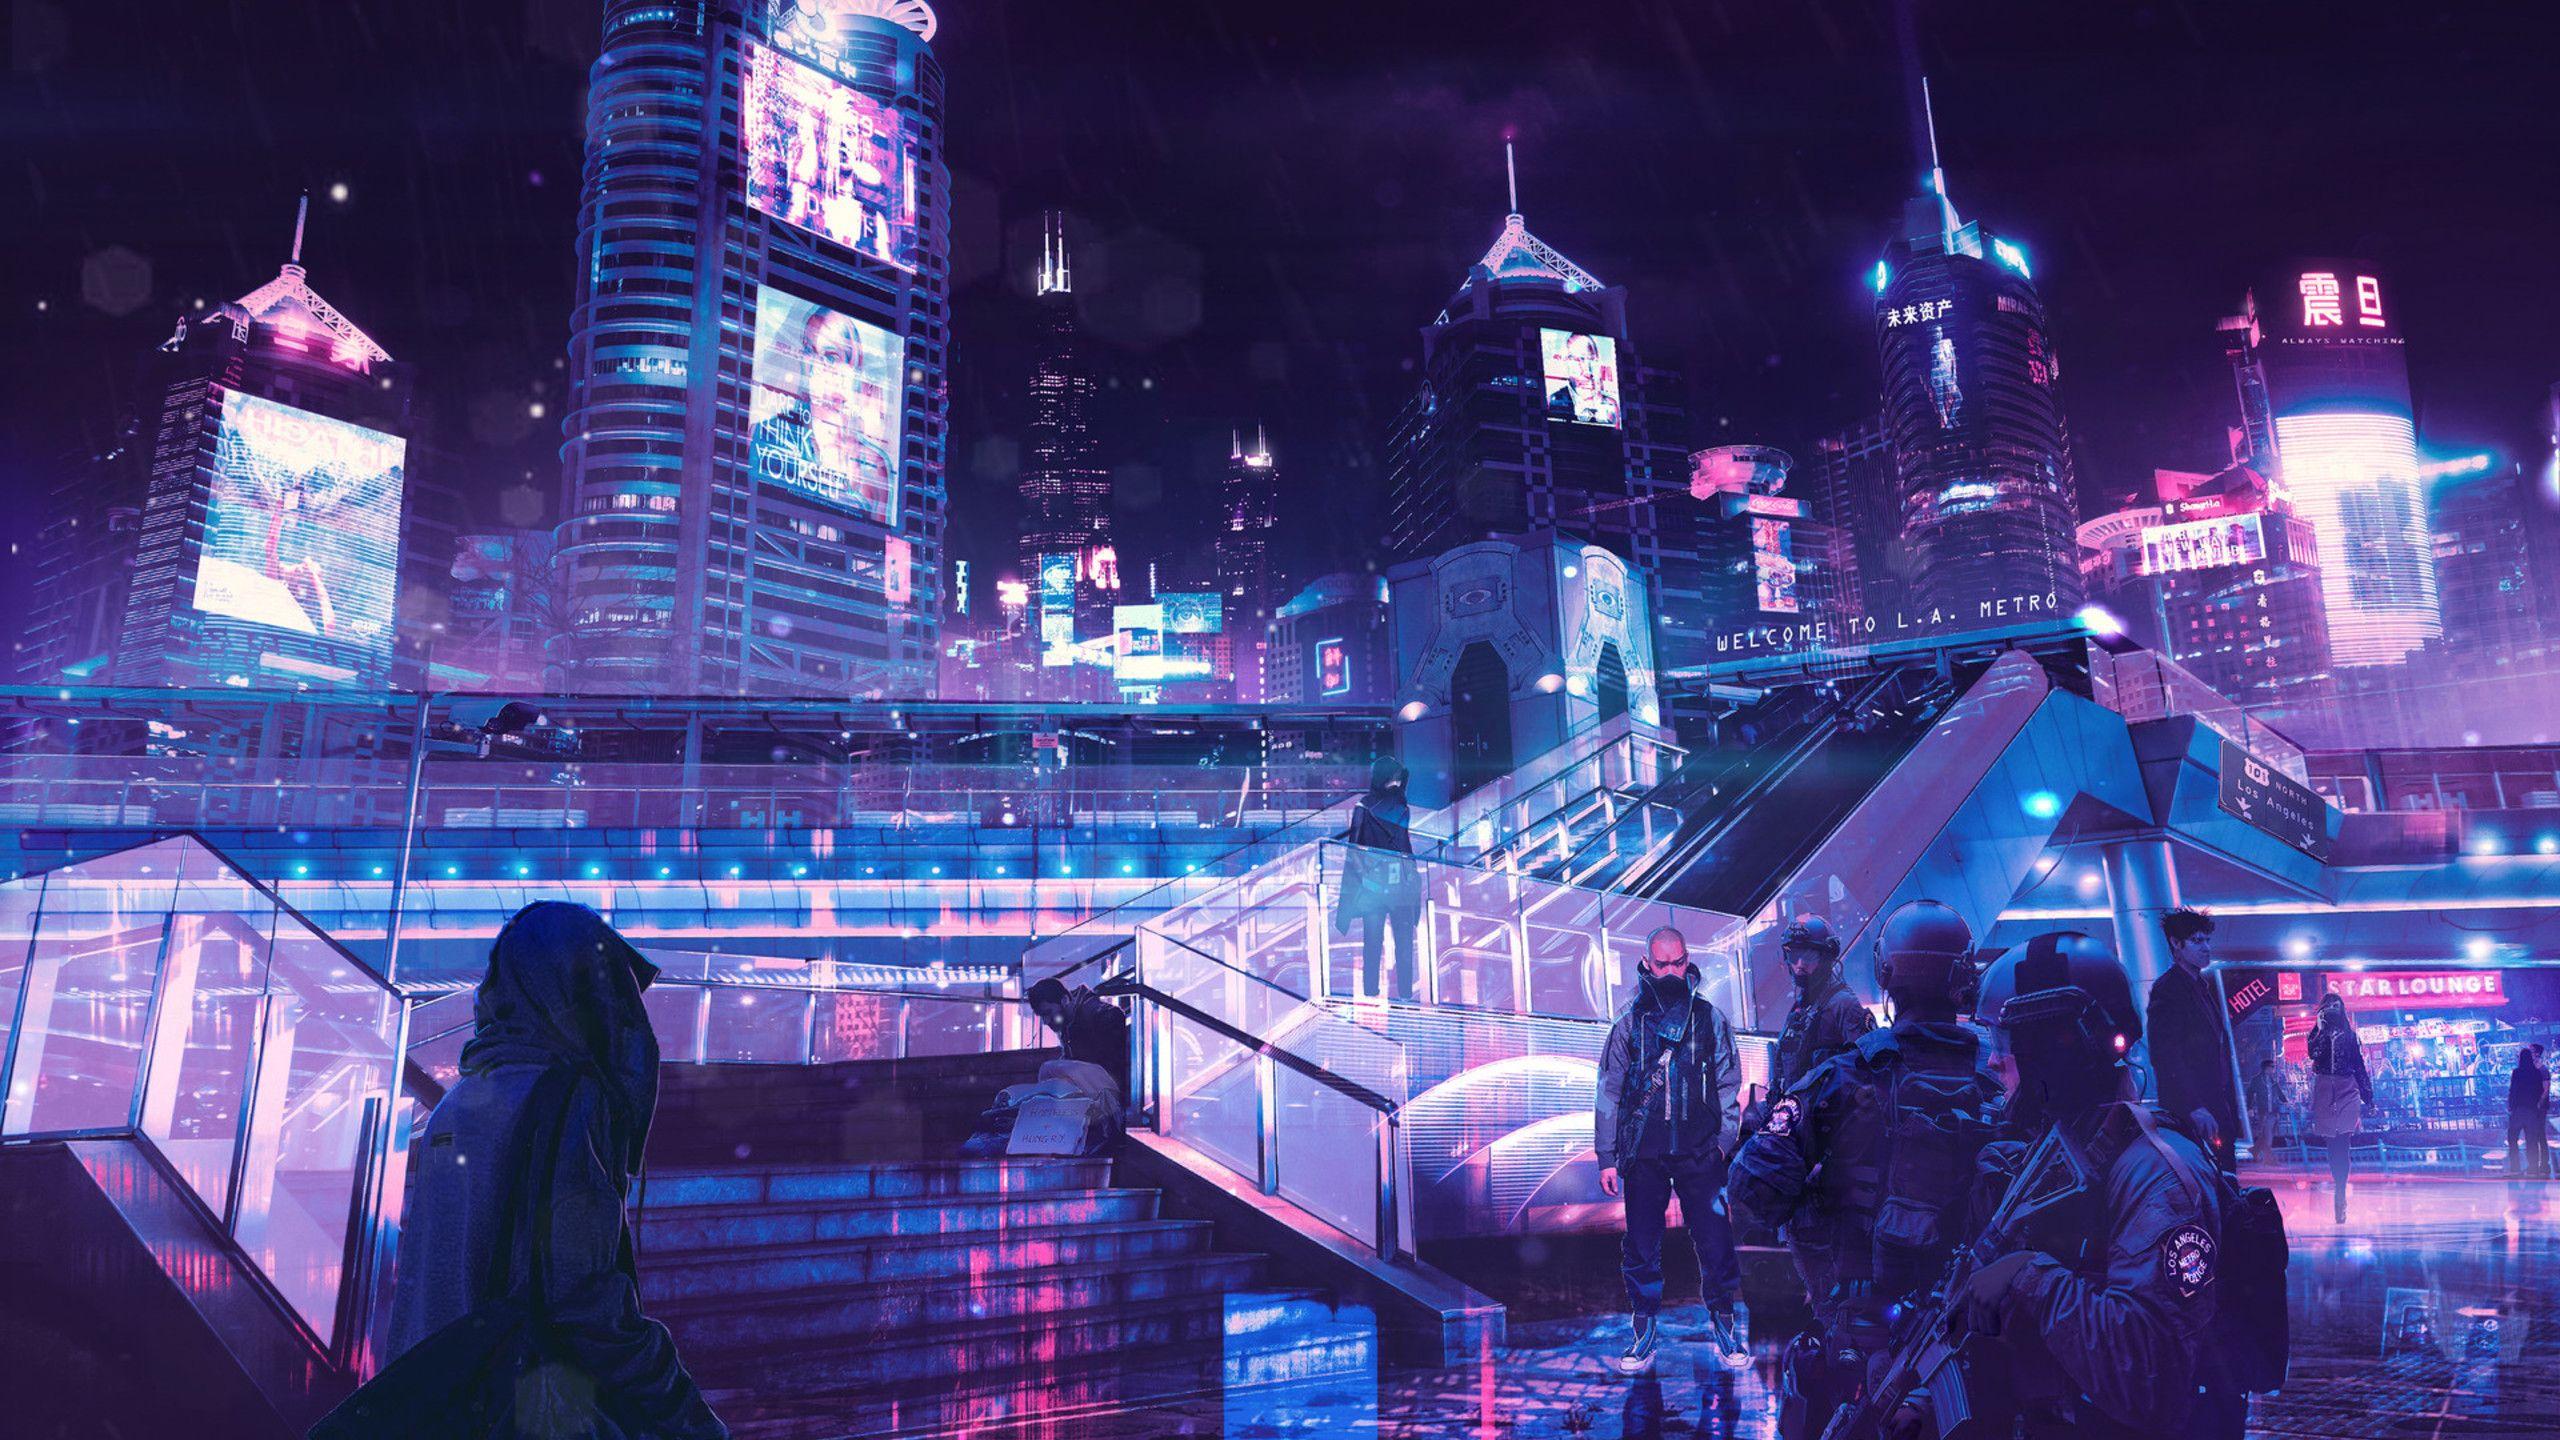 Cyberpunk Neon City S0 Jpg Cyberpunk City City Wallpaper Neon Wallpaper